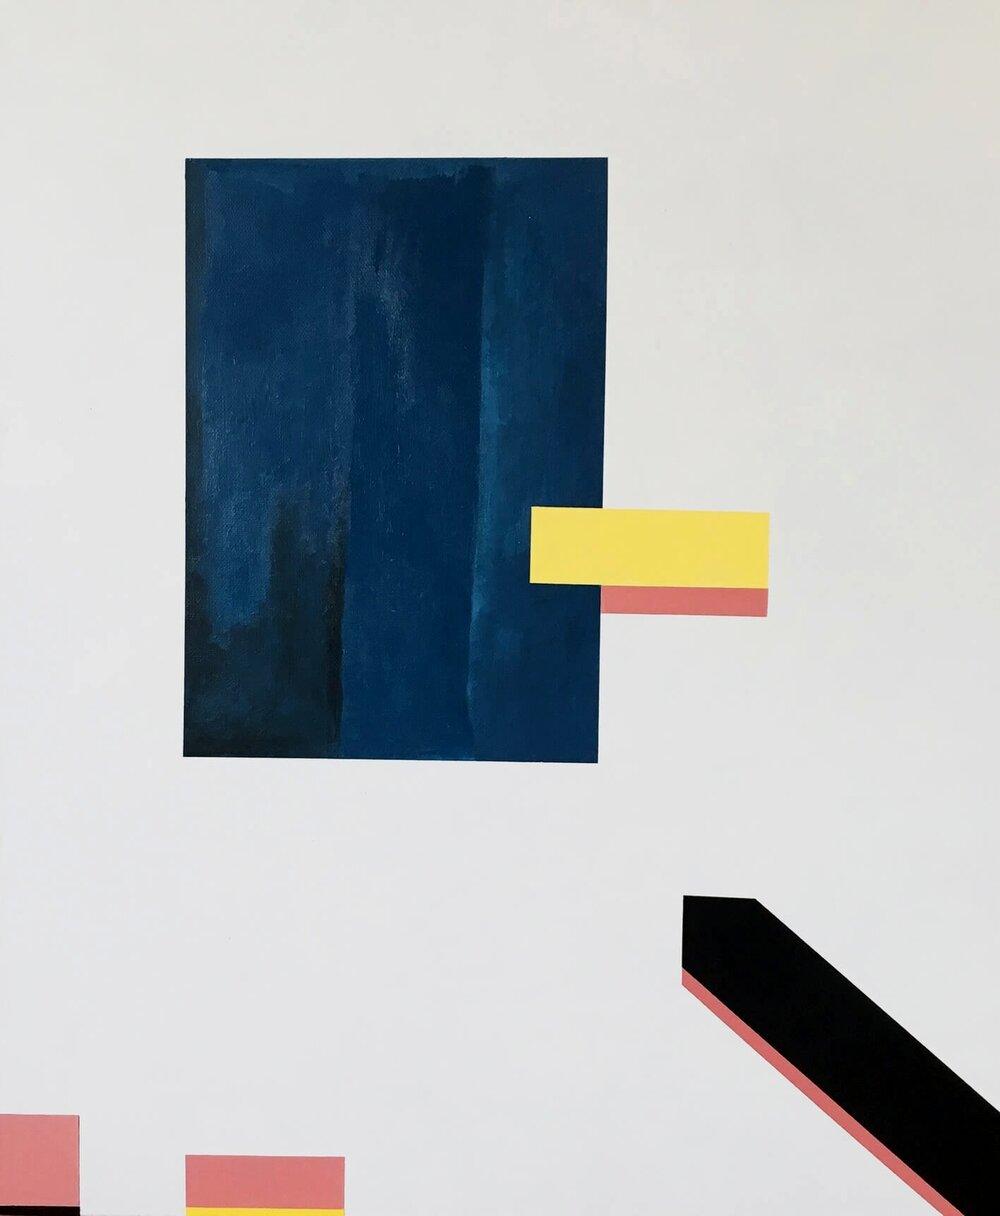 Minimal 10, 60 cm x 50 x 4 cm, Acryl auf Leinwand, © Ute Latzke, 2016, 500,- Euro.